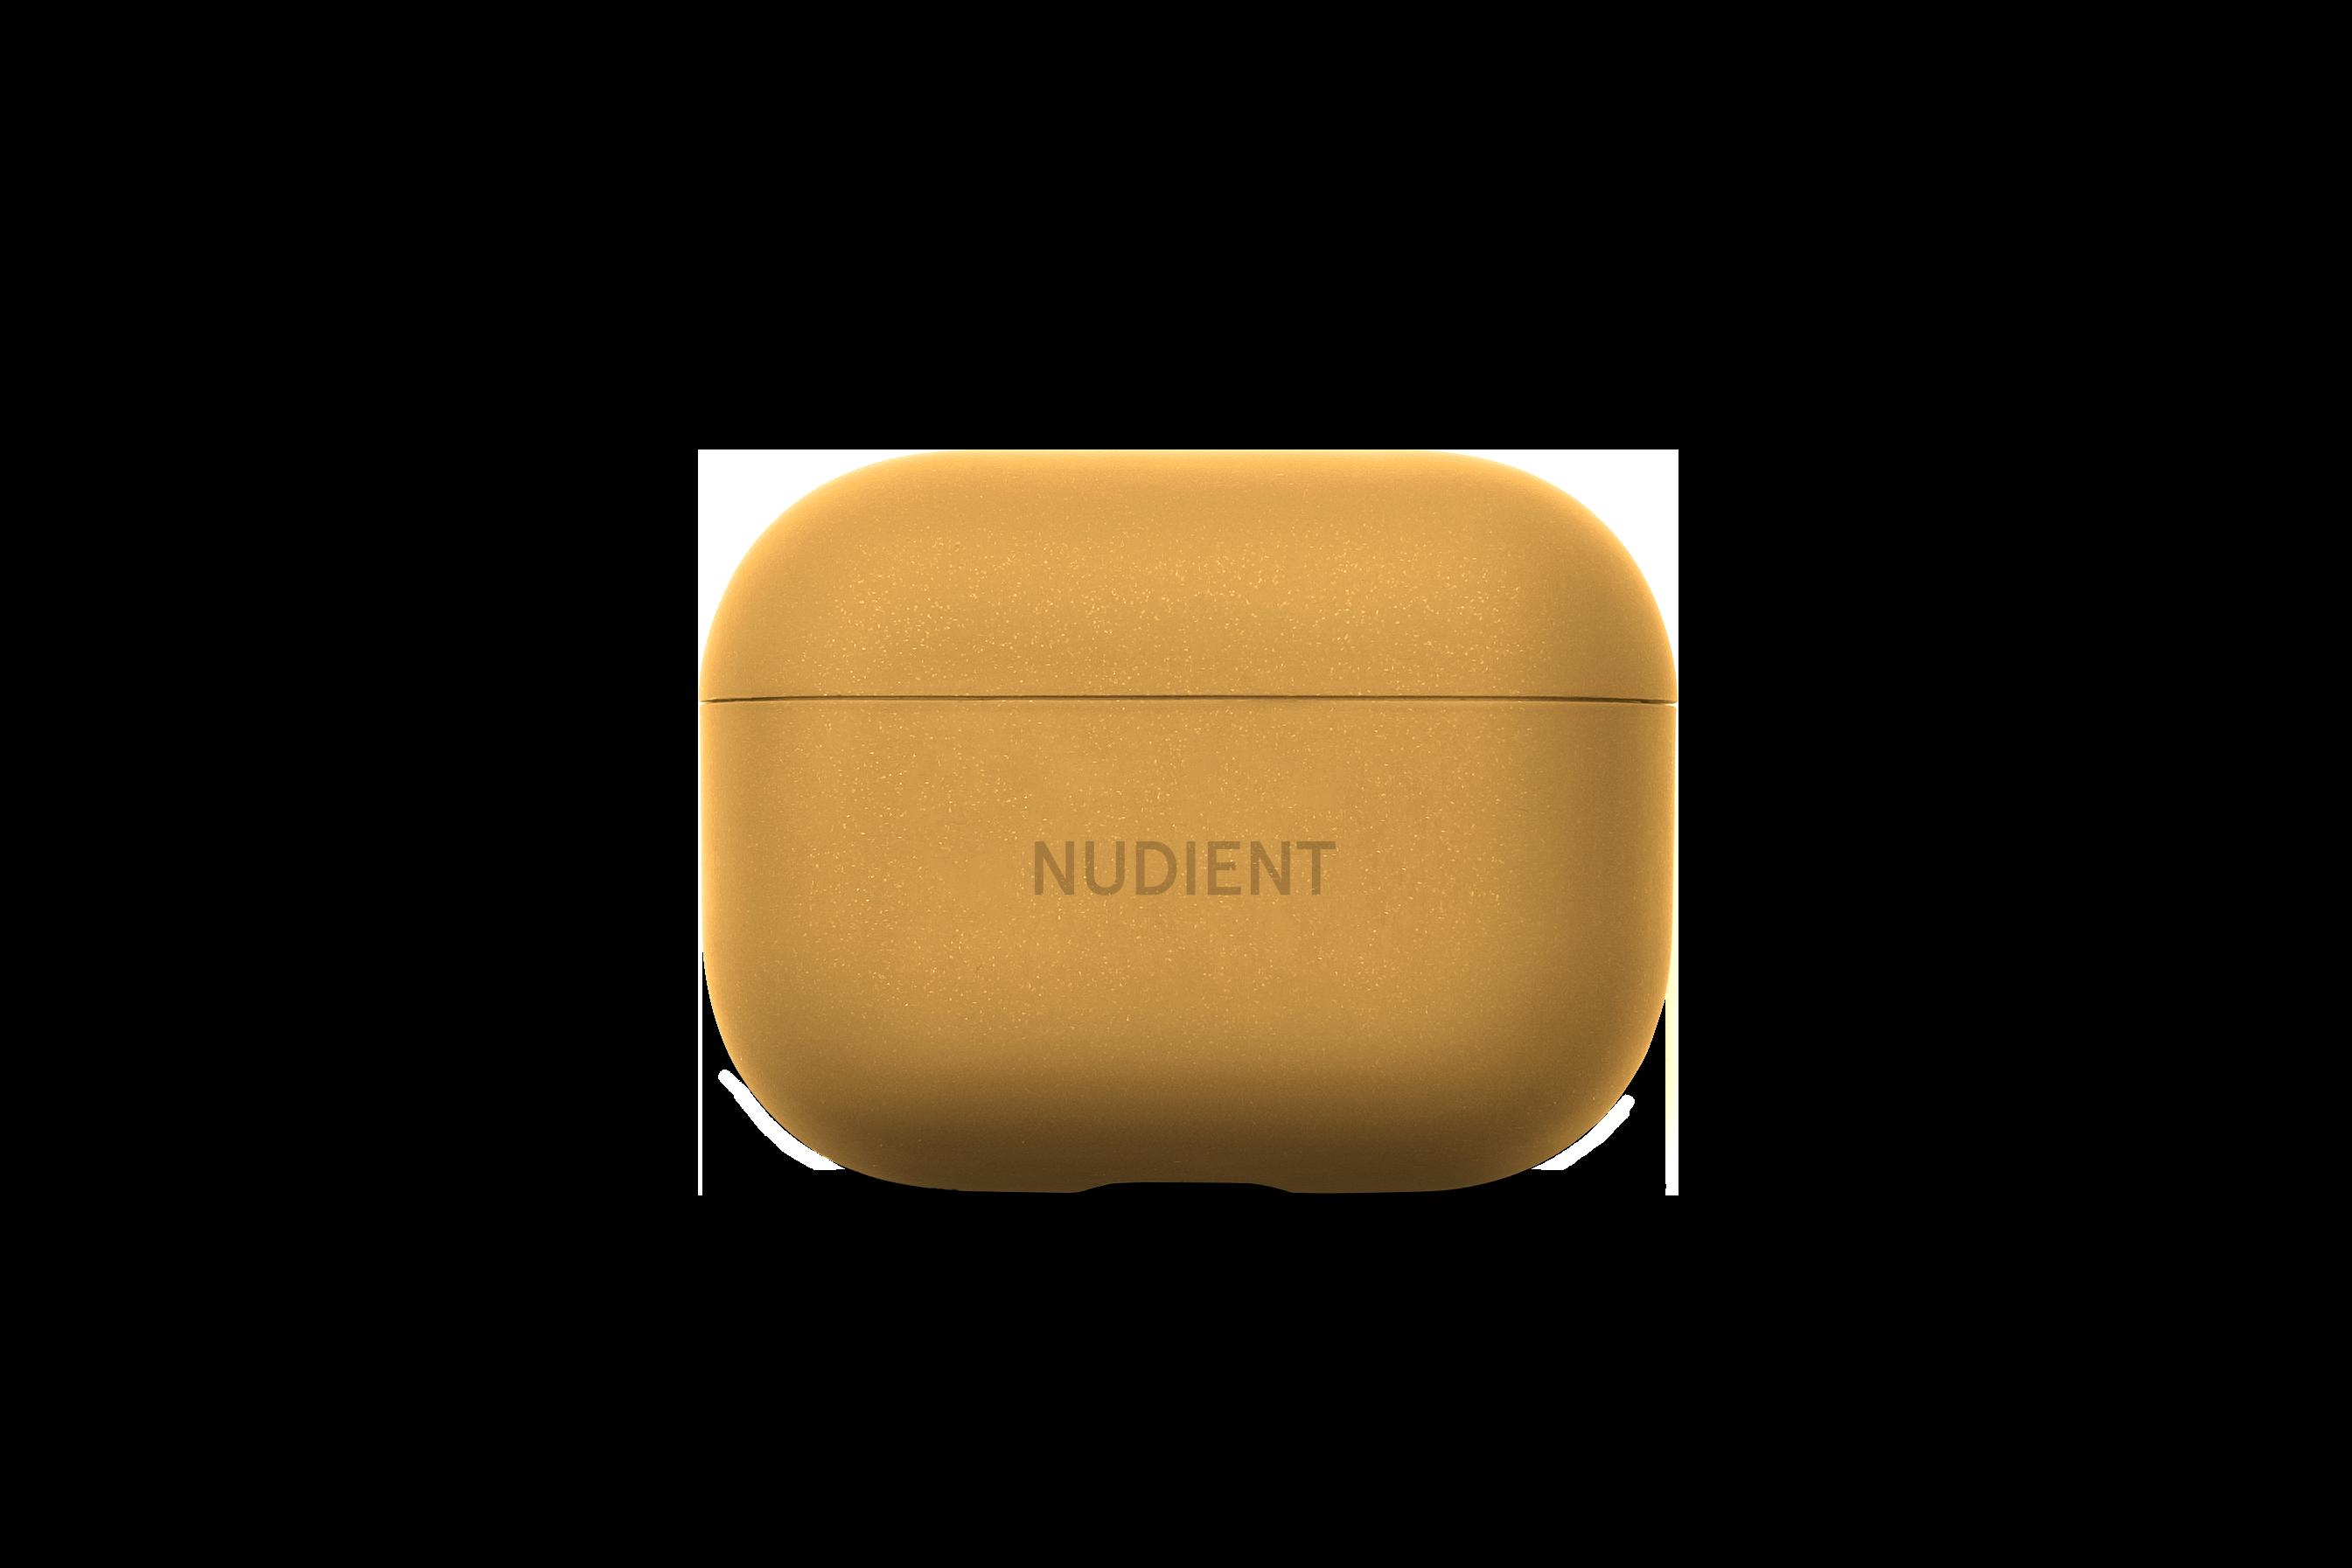 Case AirPods Pro Saffron Yellow